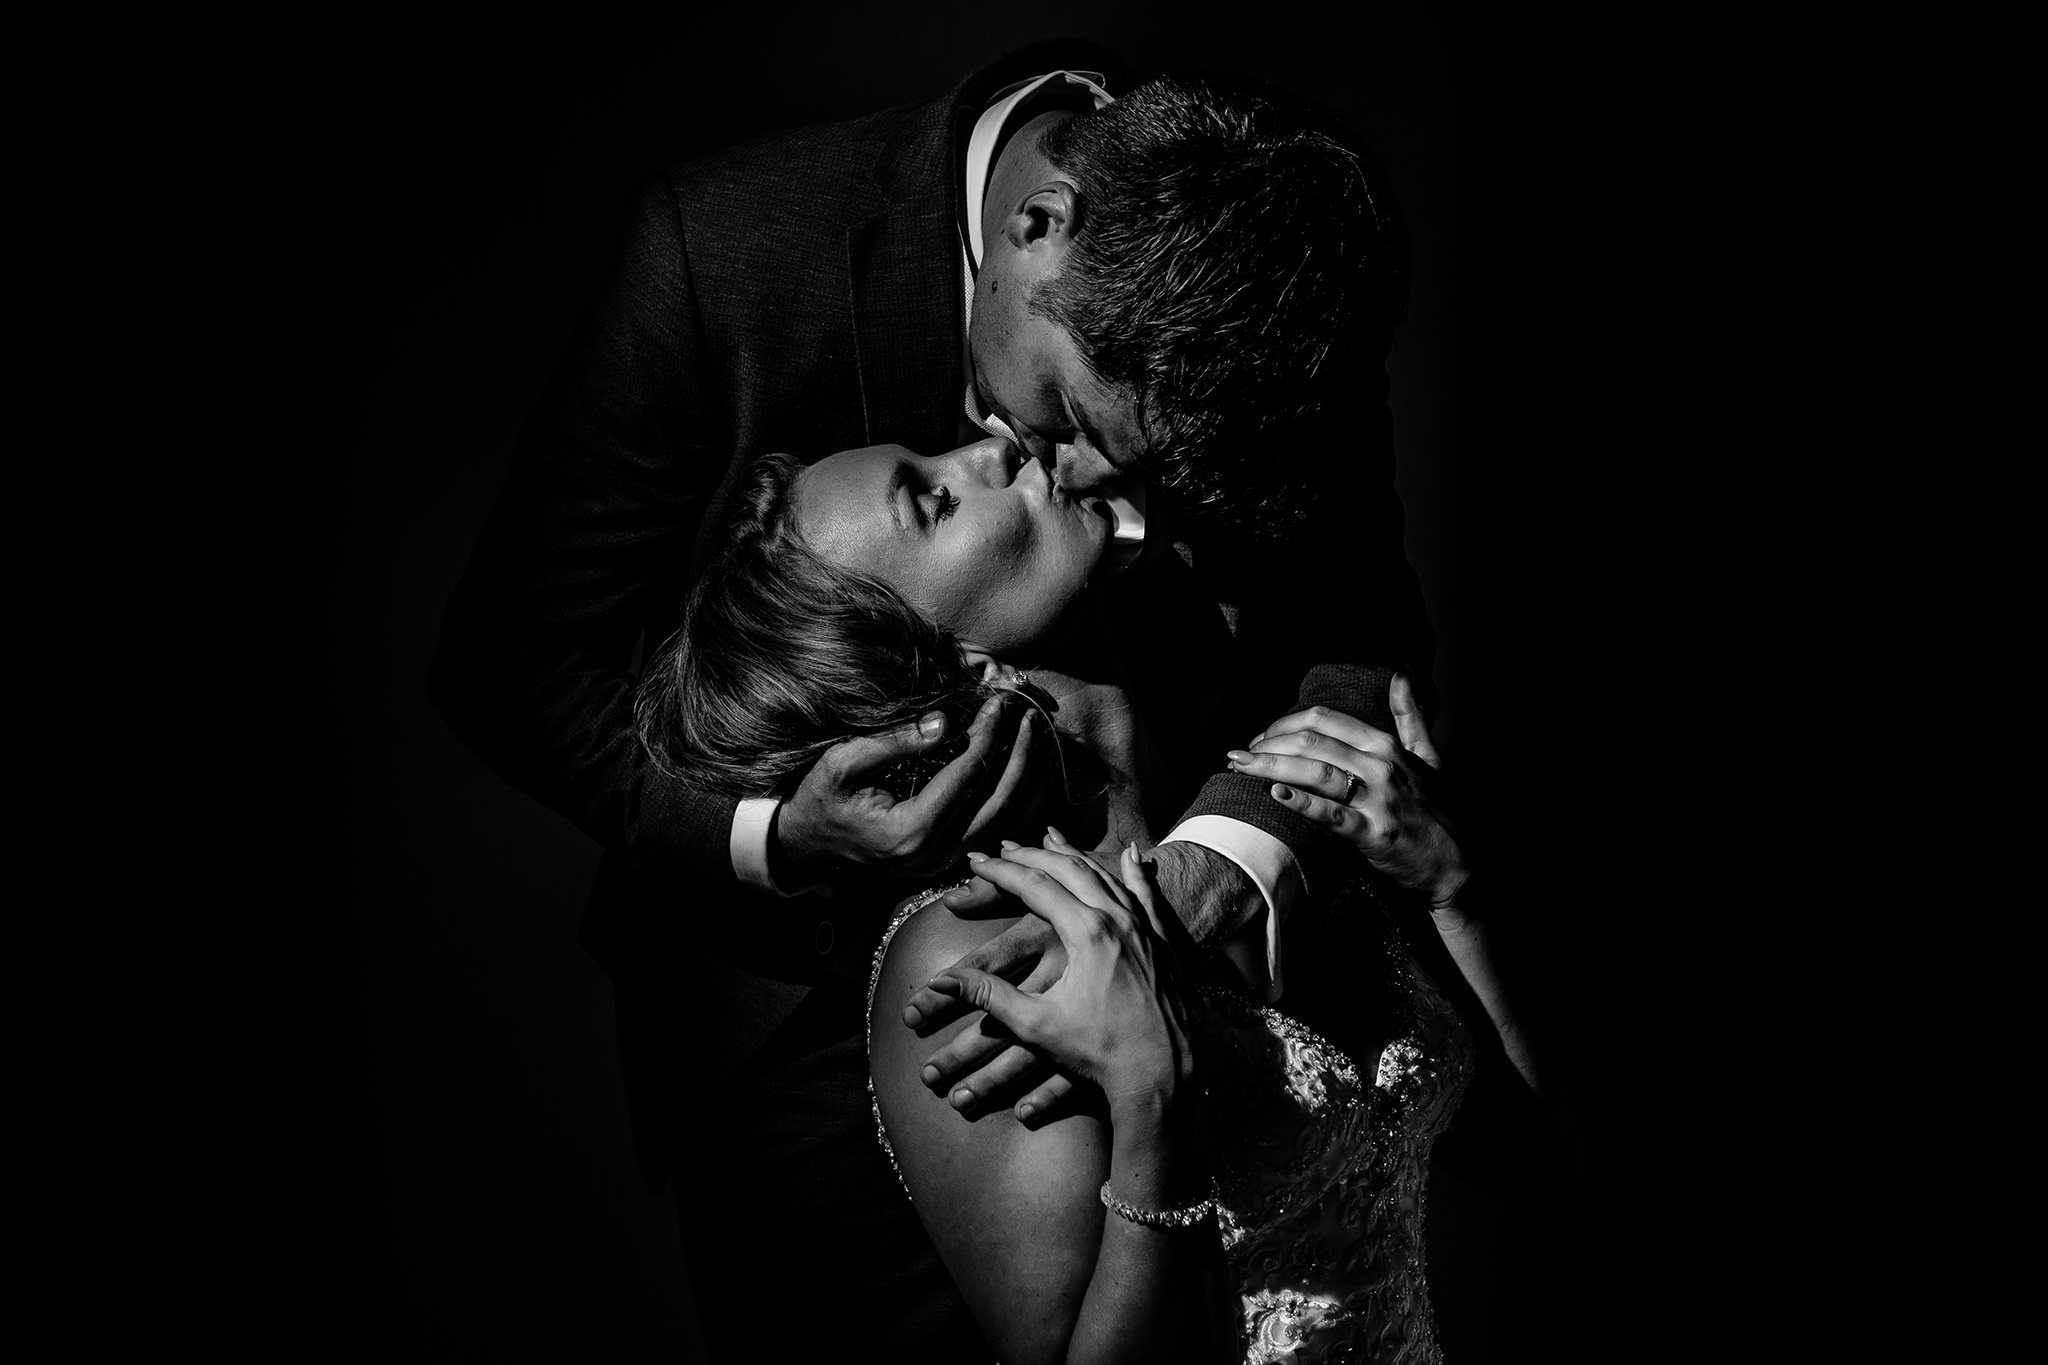 Bruidsreportage Bruidsfotografie Wedding Photographer 053 Bas Driessen Photography